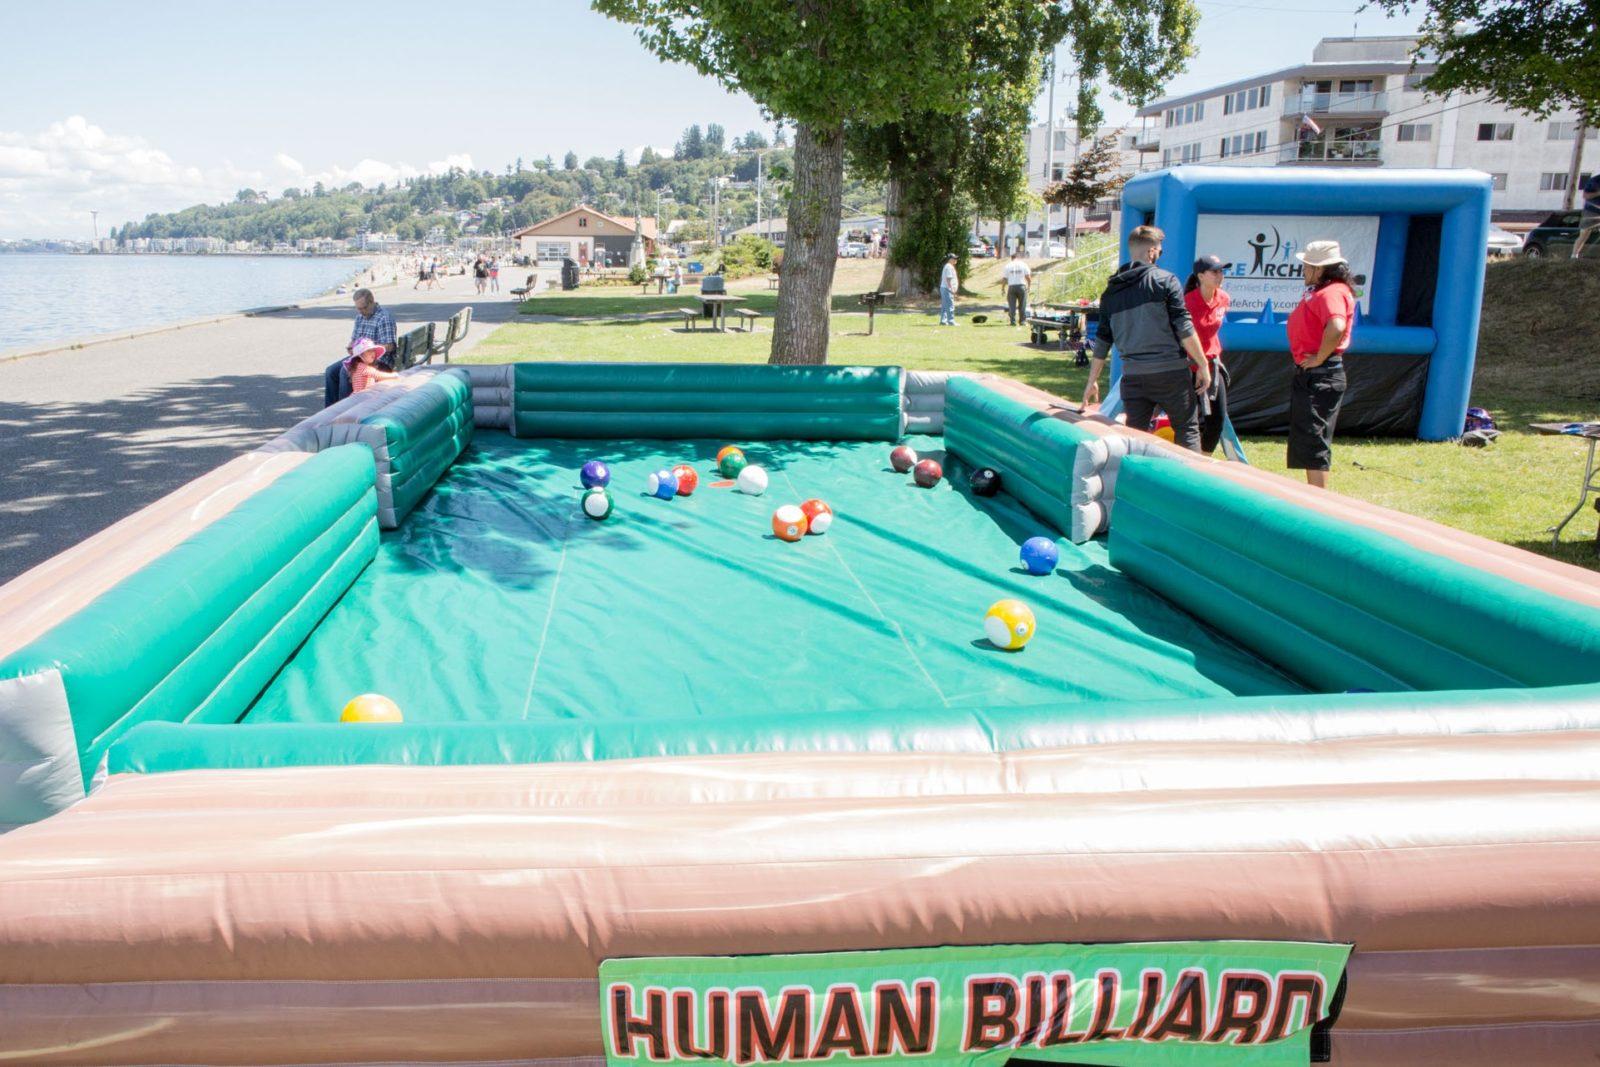 Human Billiards